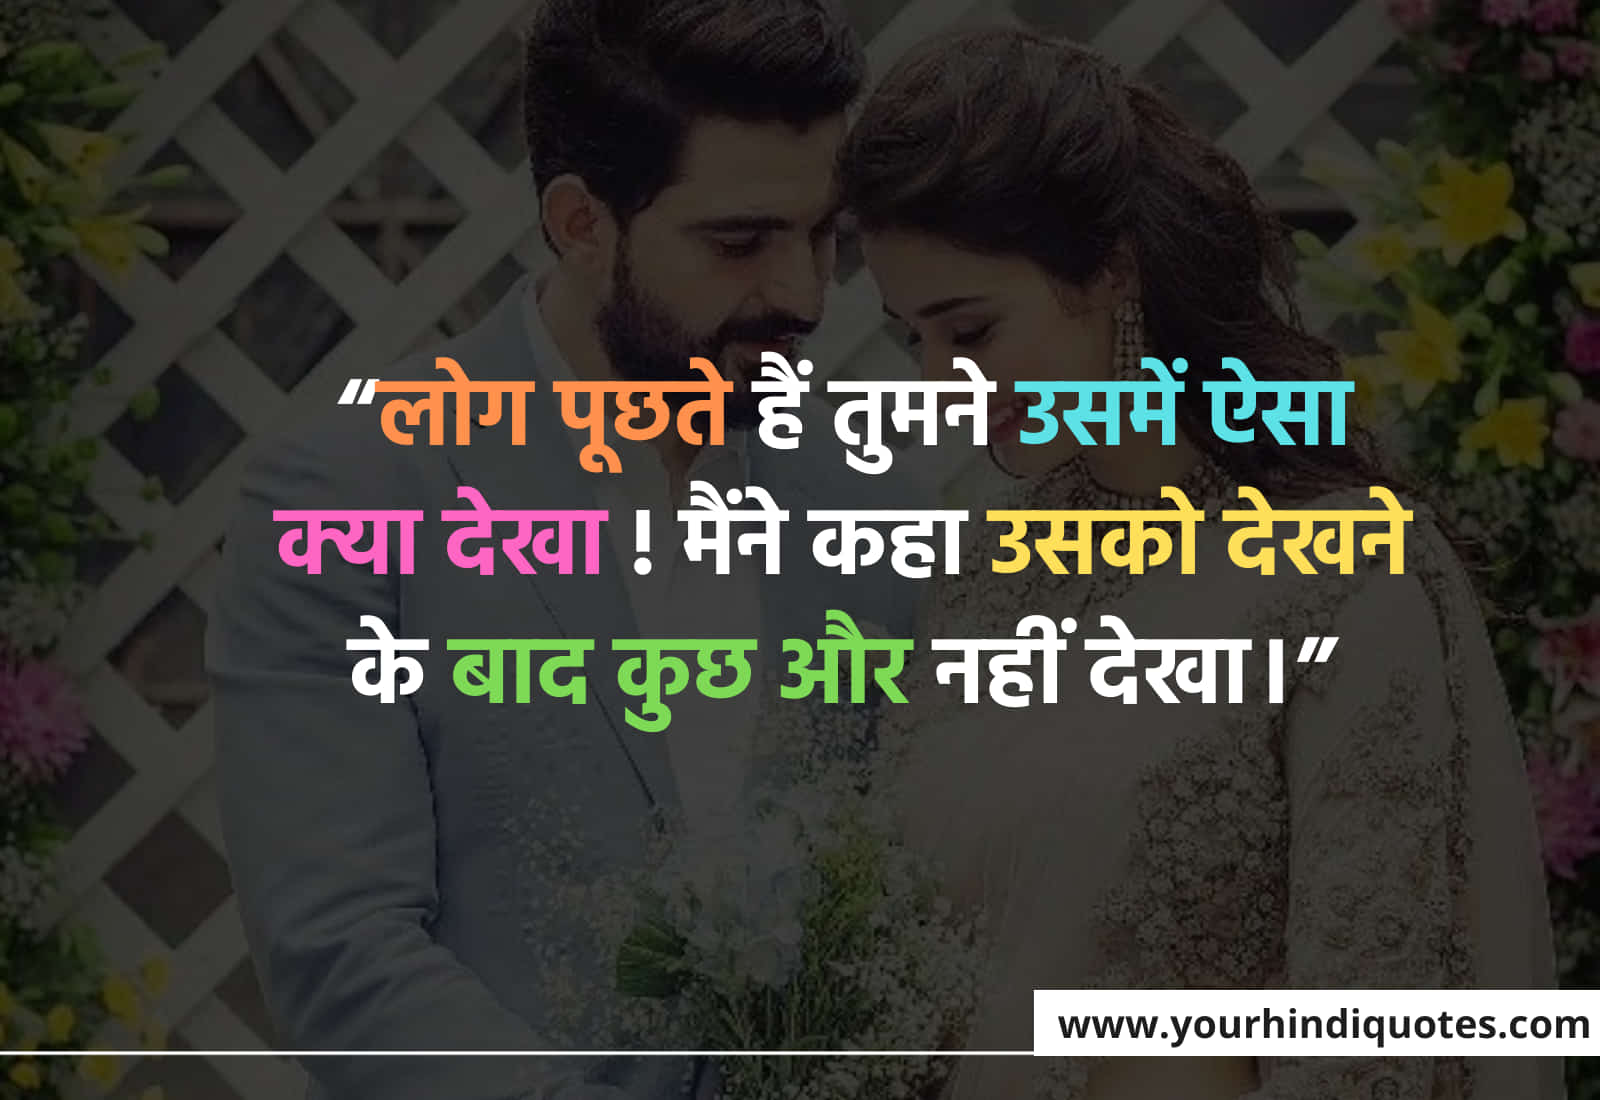 Relationship Love Status